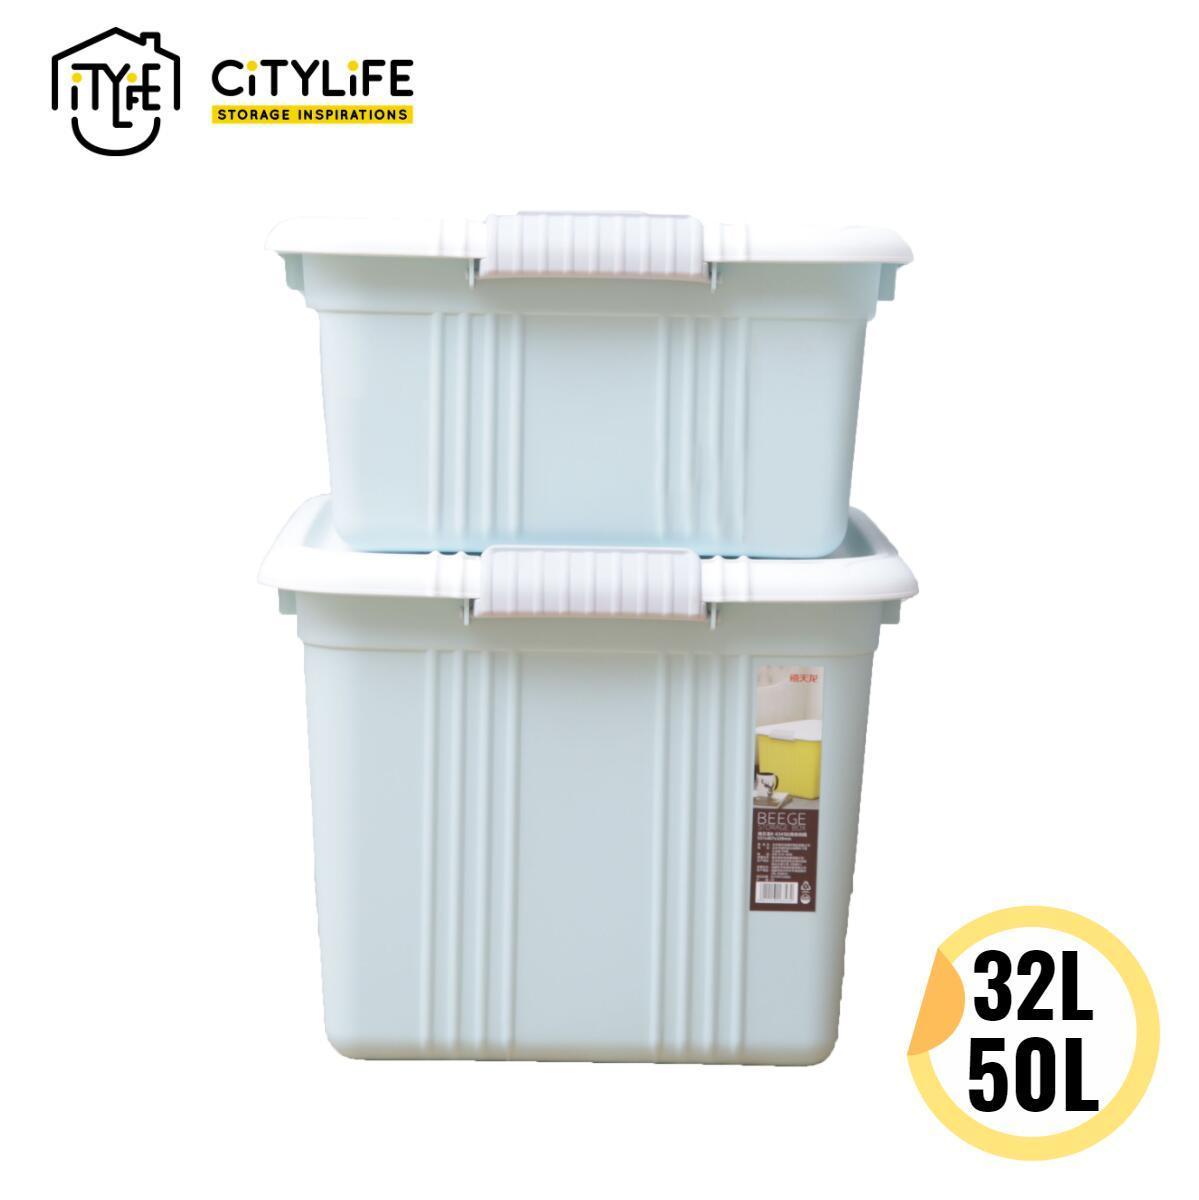 [BUNDLE OF 2] - Citylife Sugar Storage Container 50L+32L